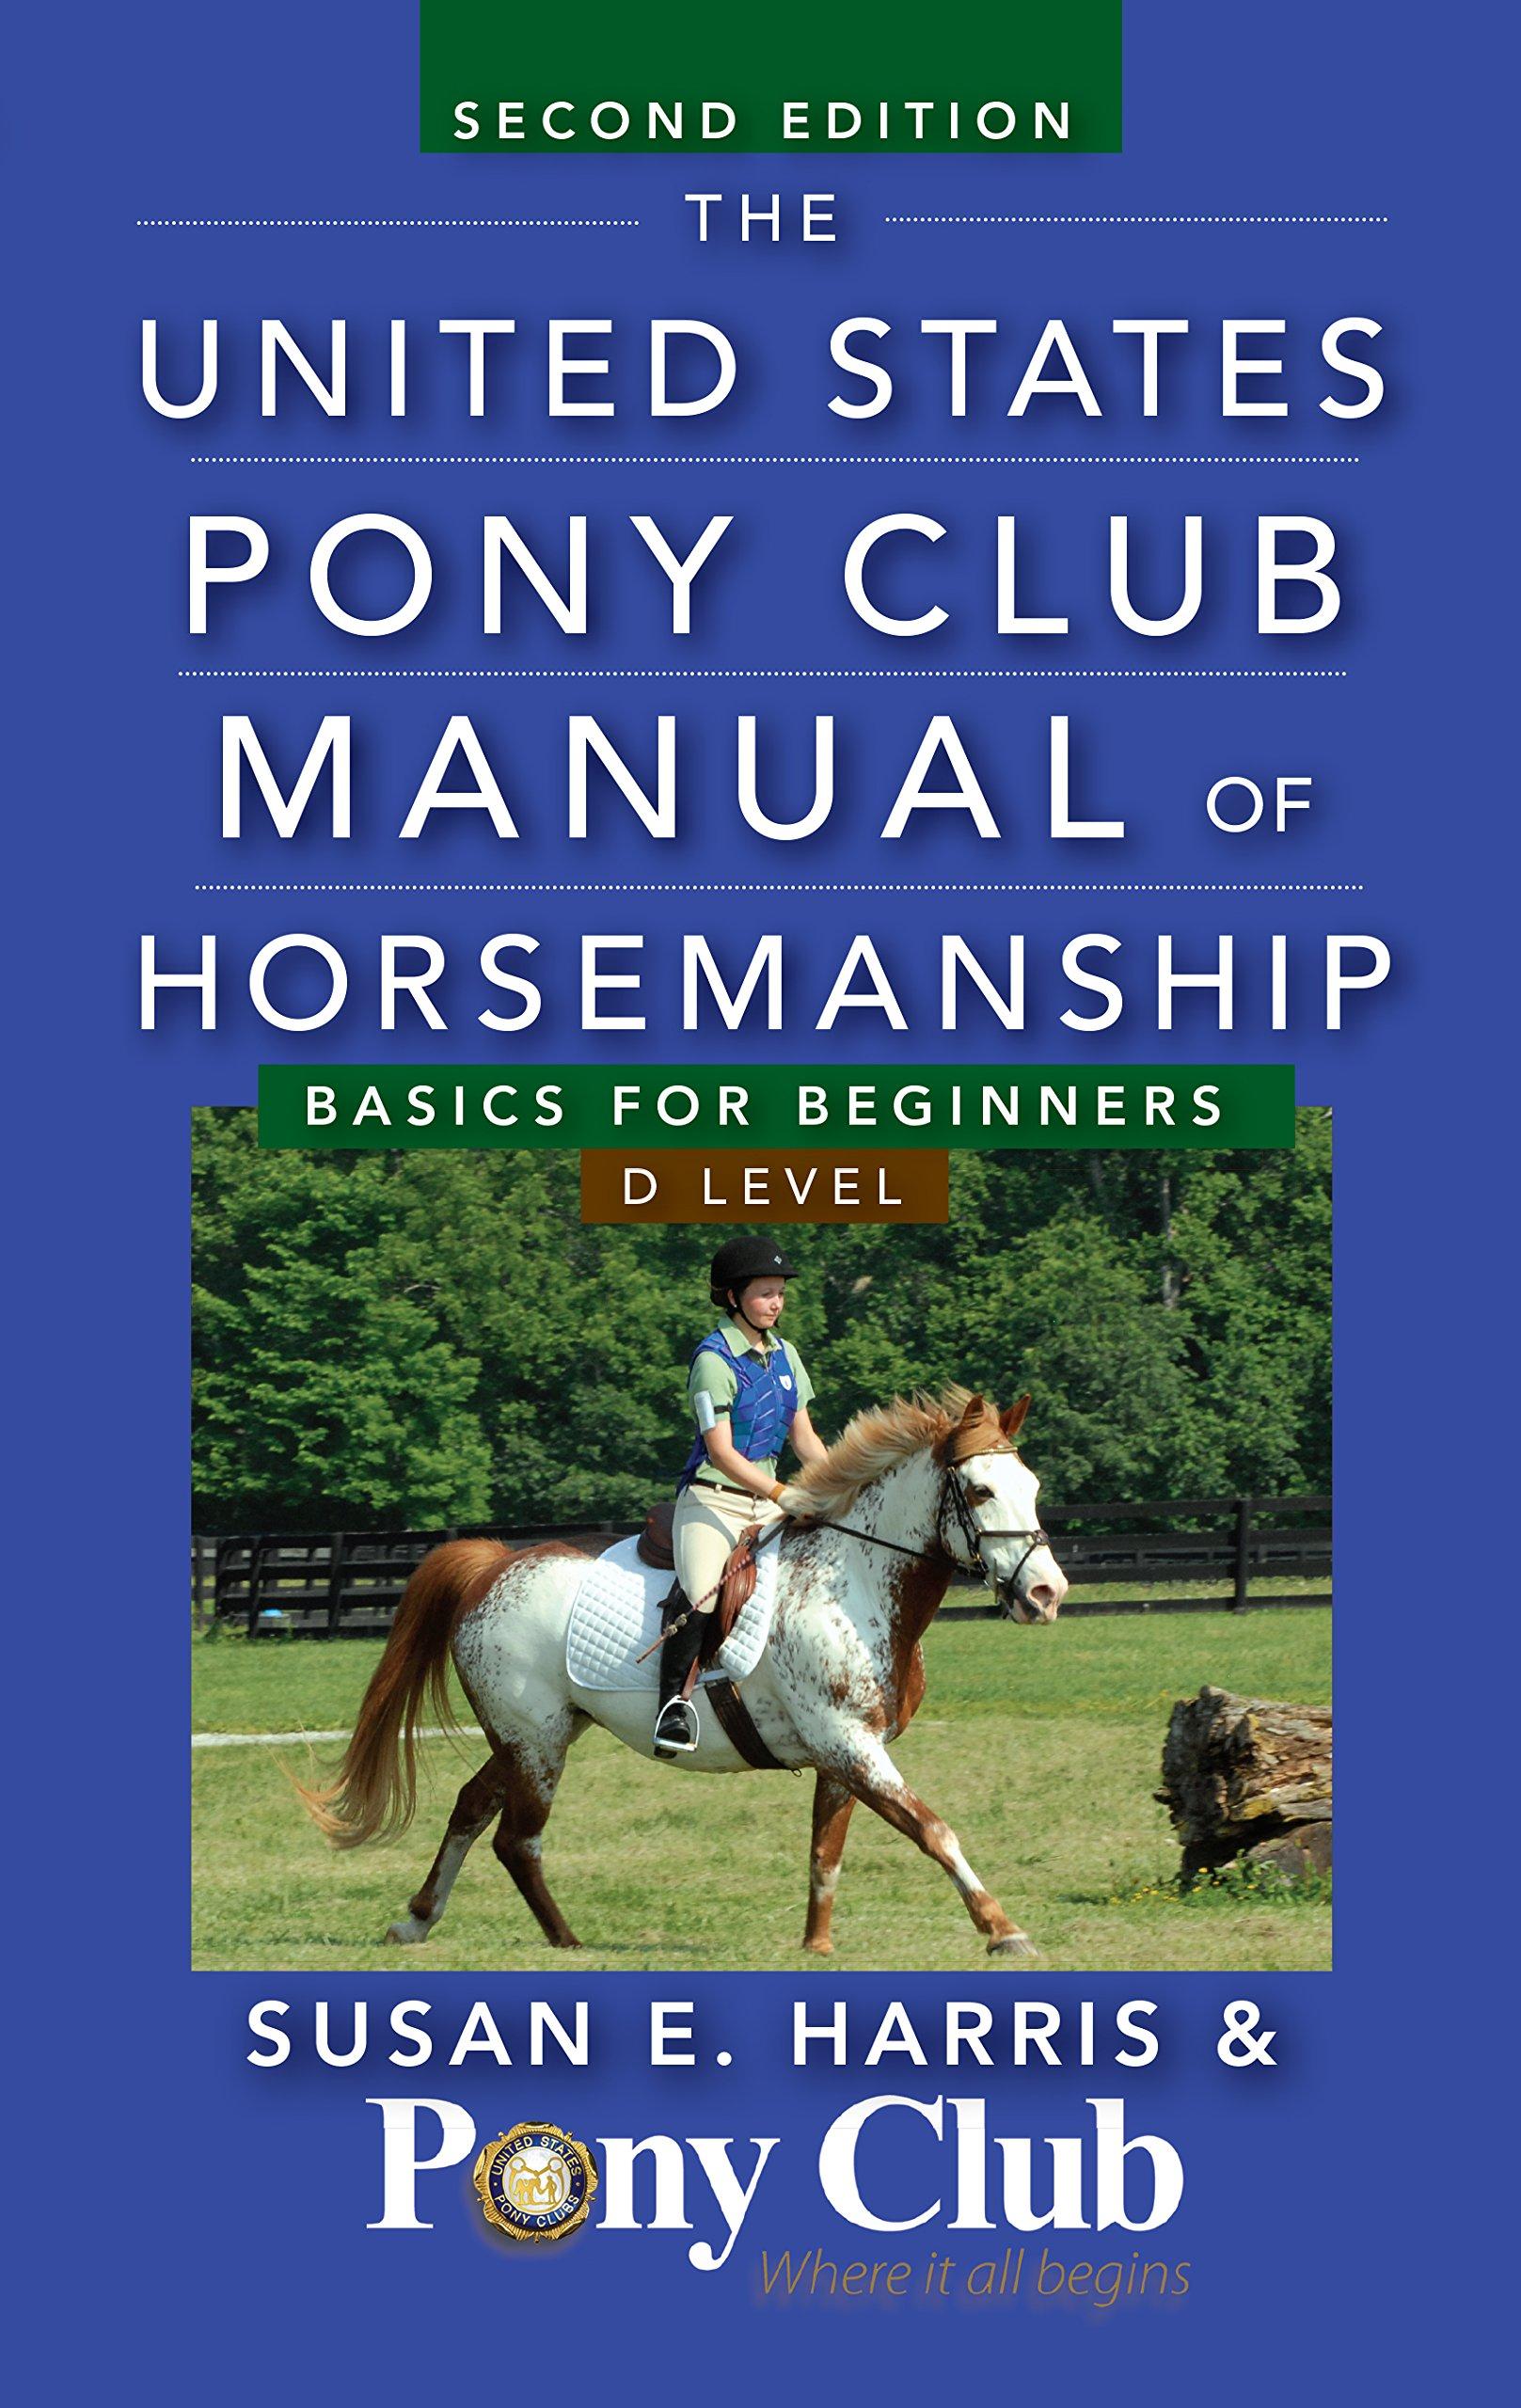 The United States Pony Club Manual of Horsemanship: Basics for Beginners /  D Level: Susan E. Harris: 9781118123782: Amazon.com: Books